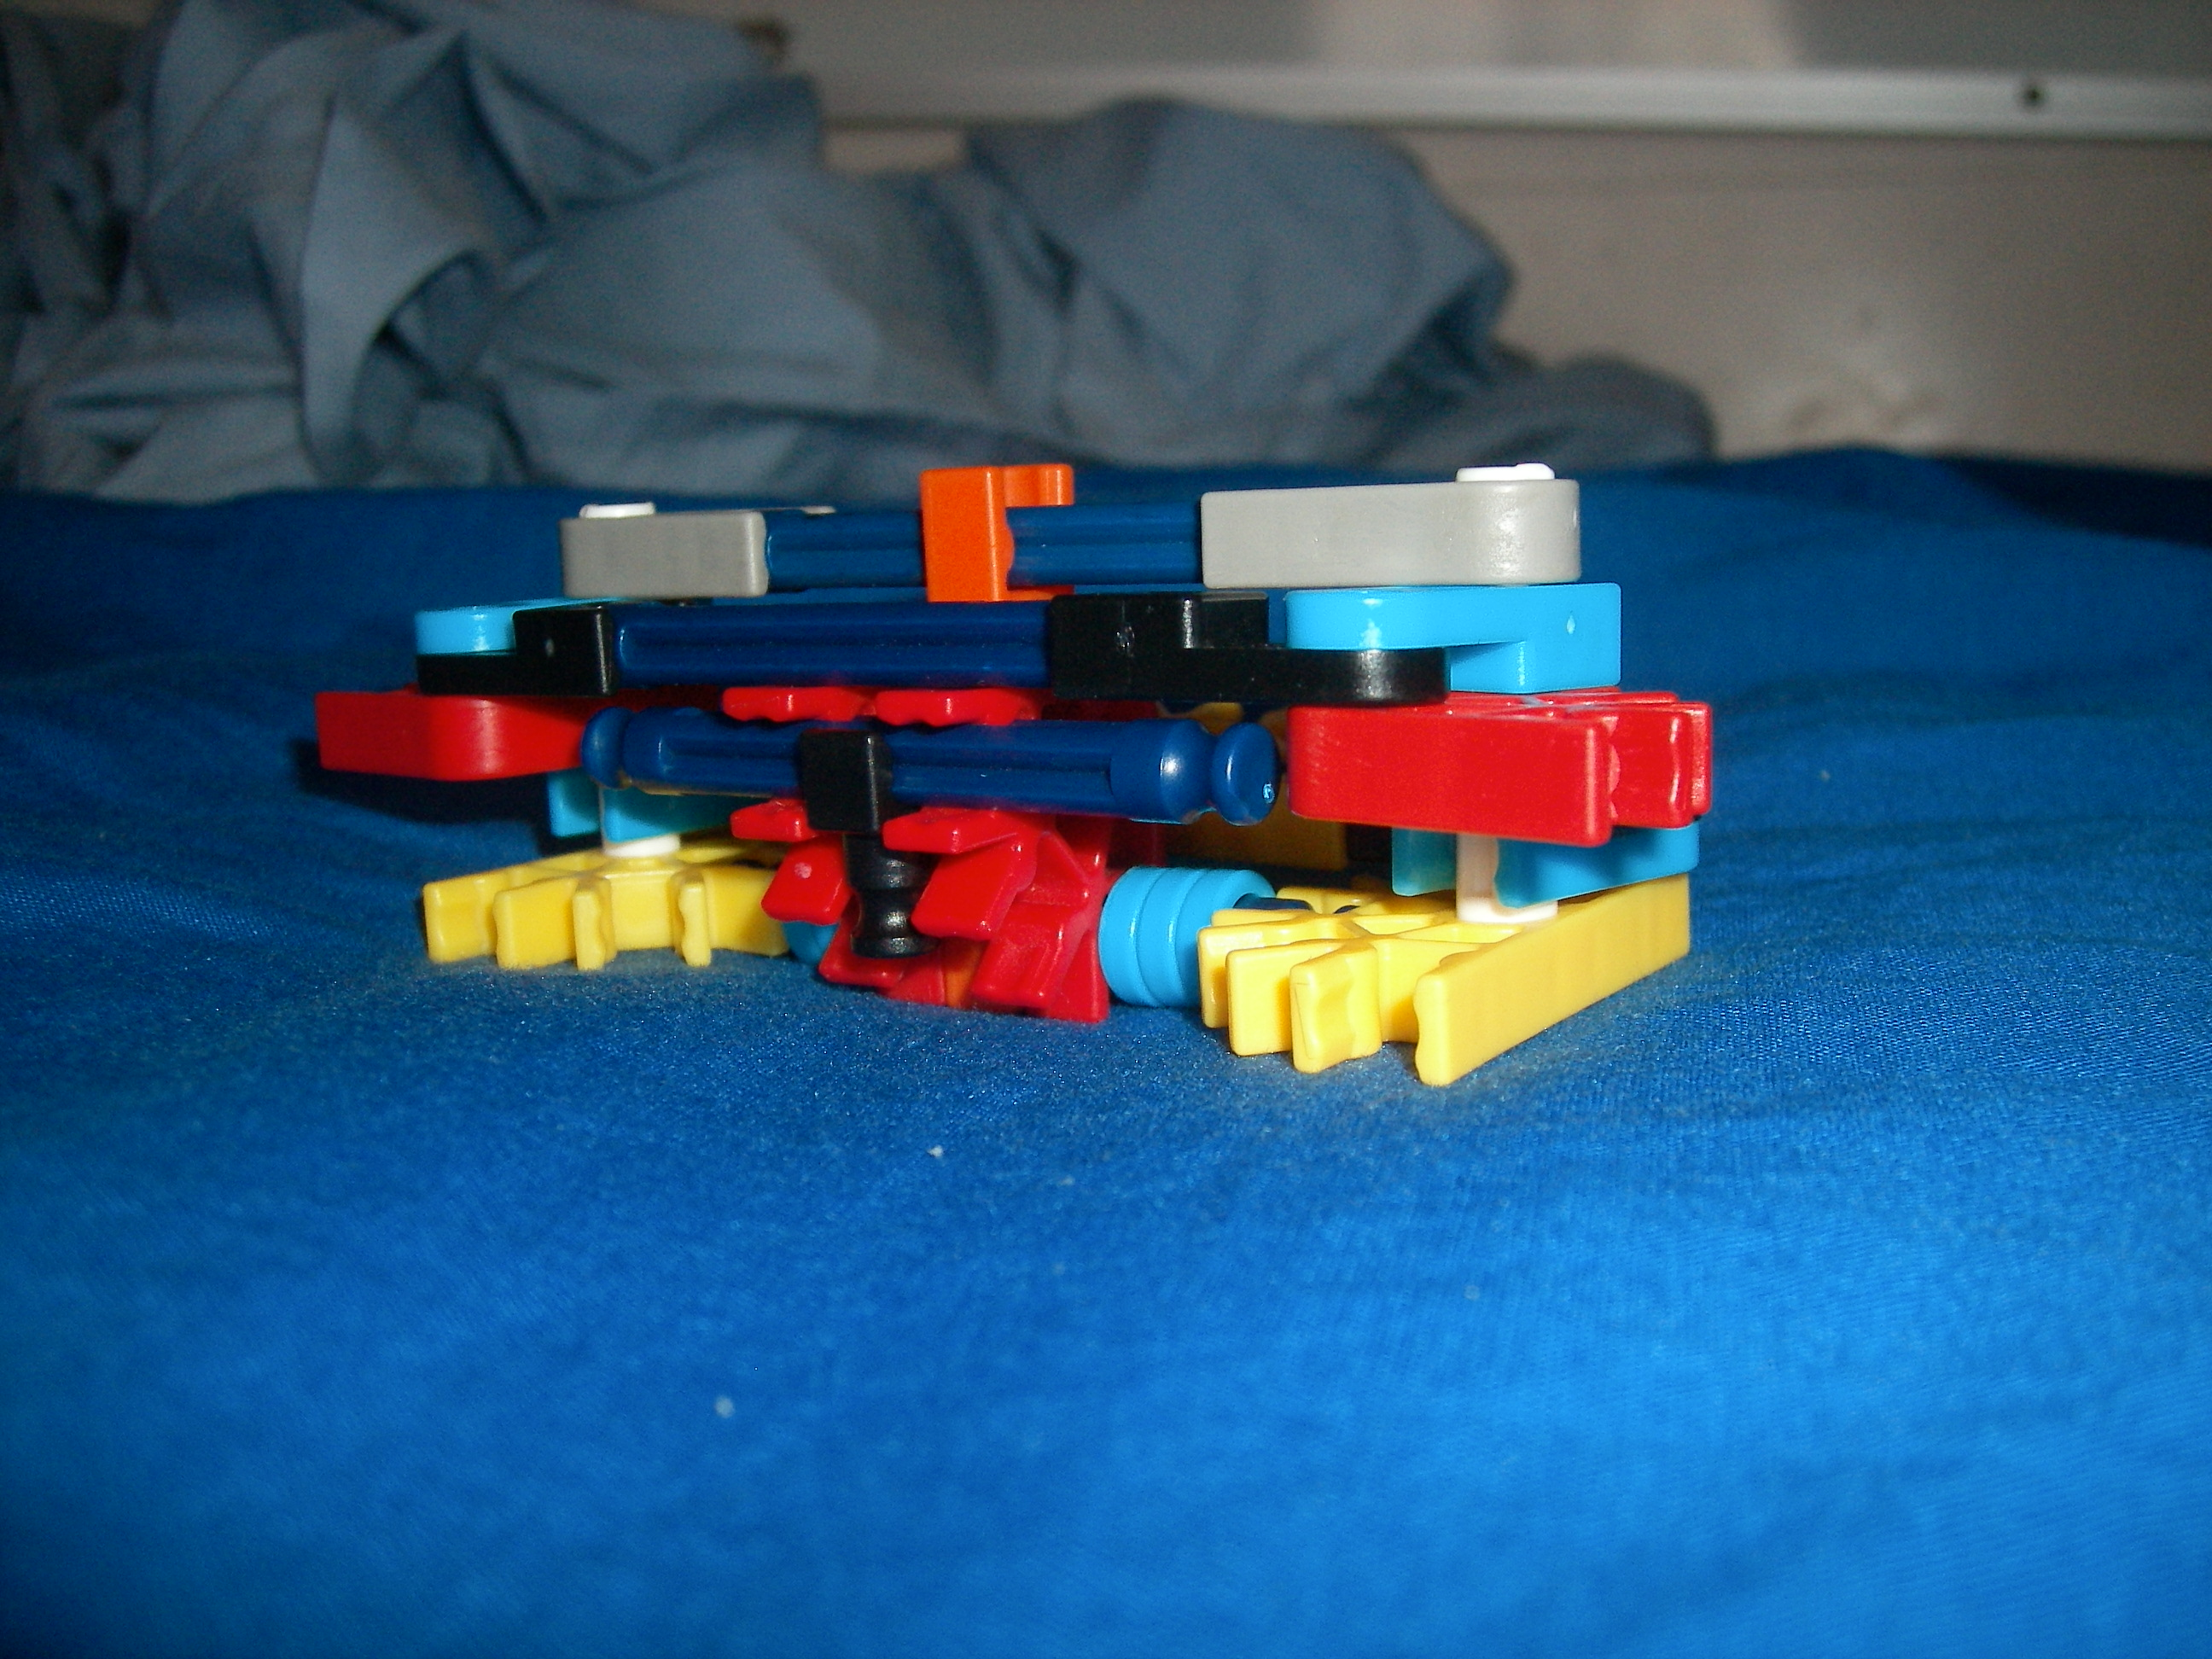 Knex Car Steering mechanism with ajustable steering ratio